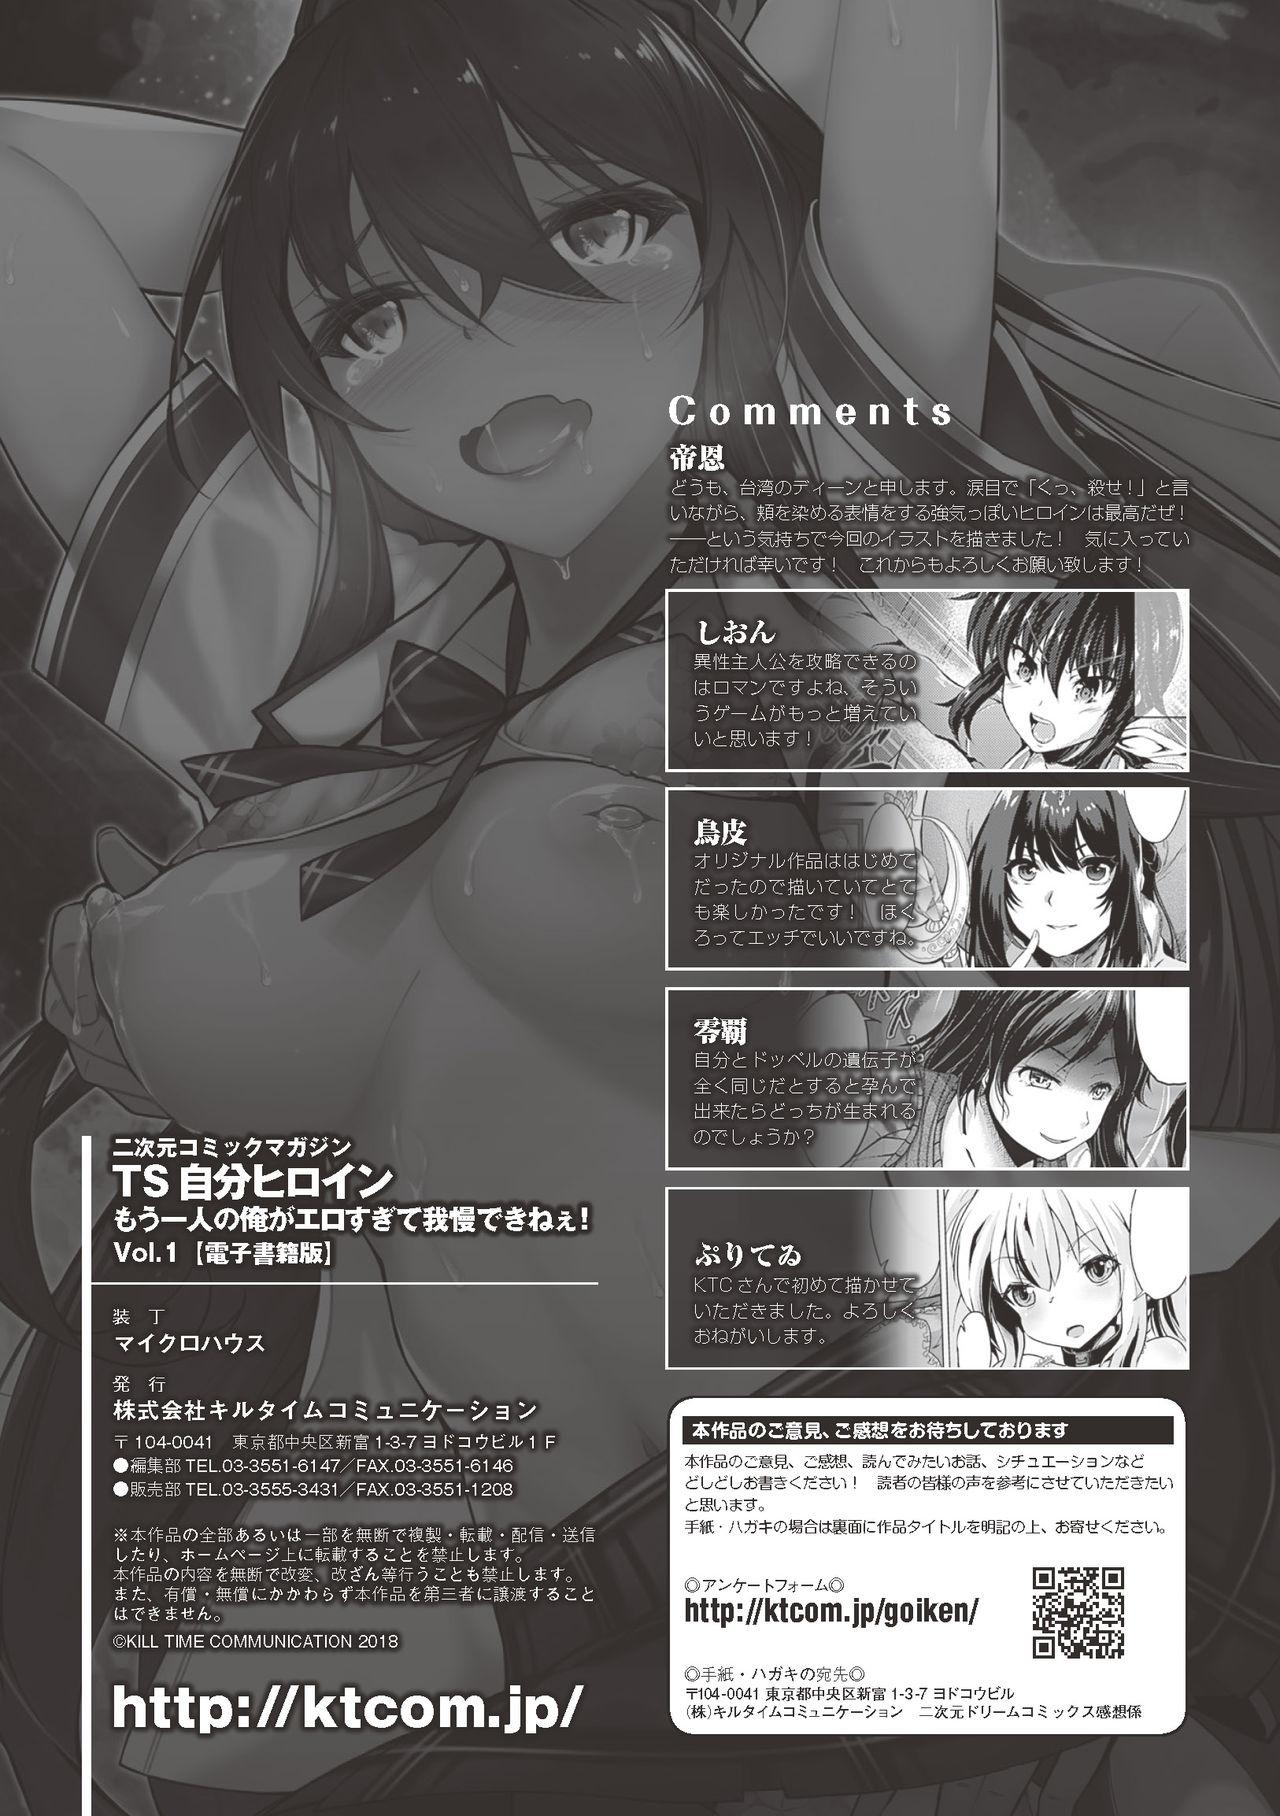 2D Comic Magazine TS Jibun Heroine mou Hitori no Ore ga Erosugite Gaman Dekinee! Vol. 1 84